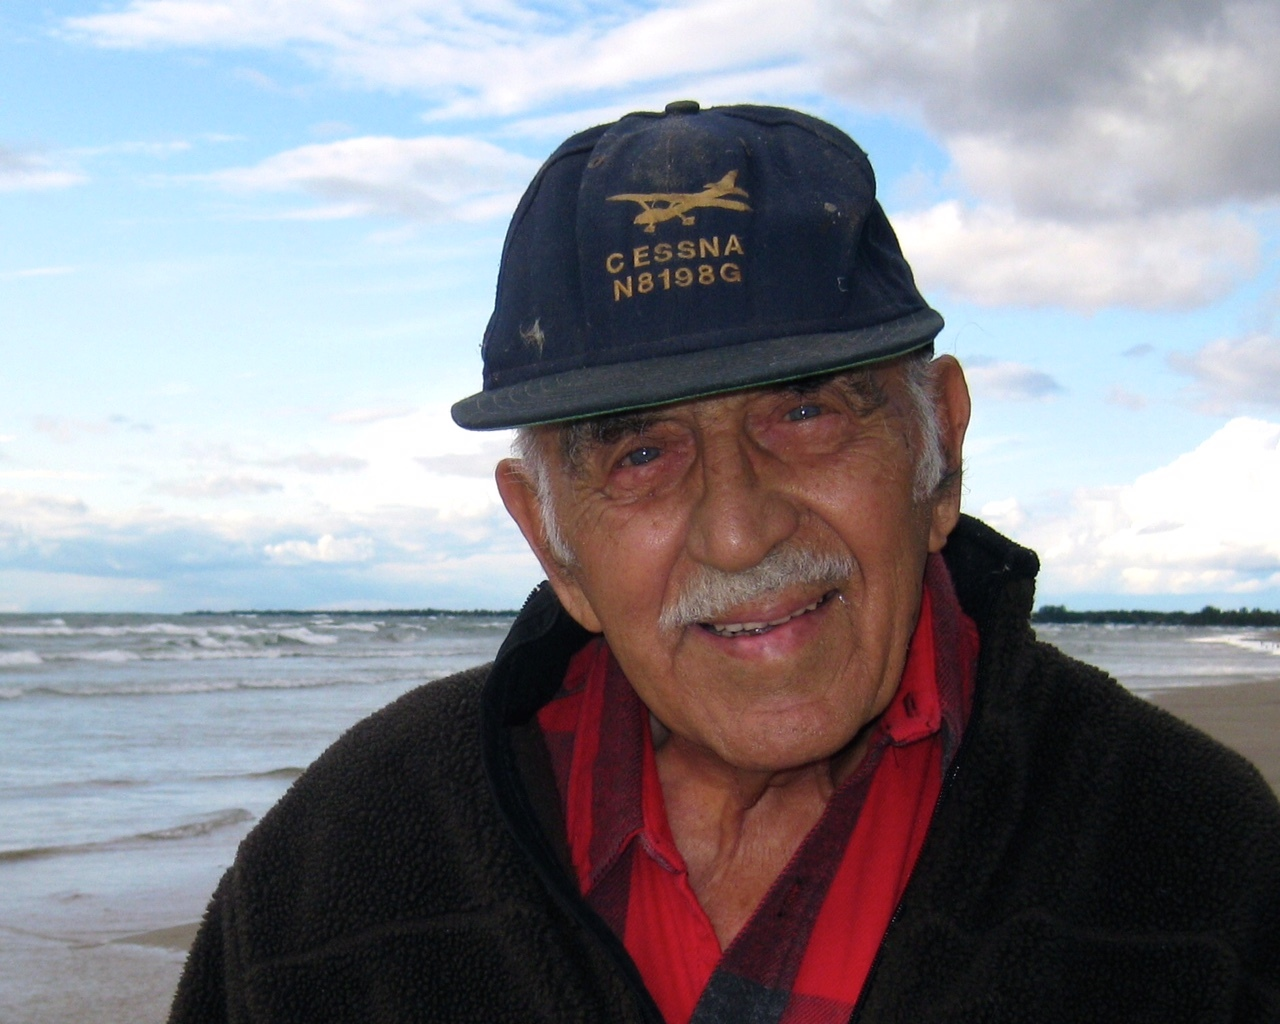 Joseph P. Navik